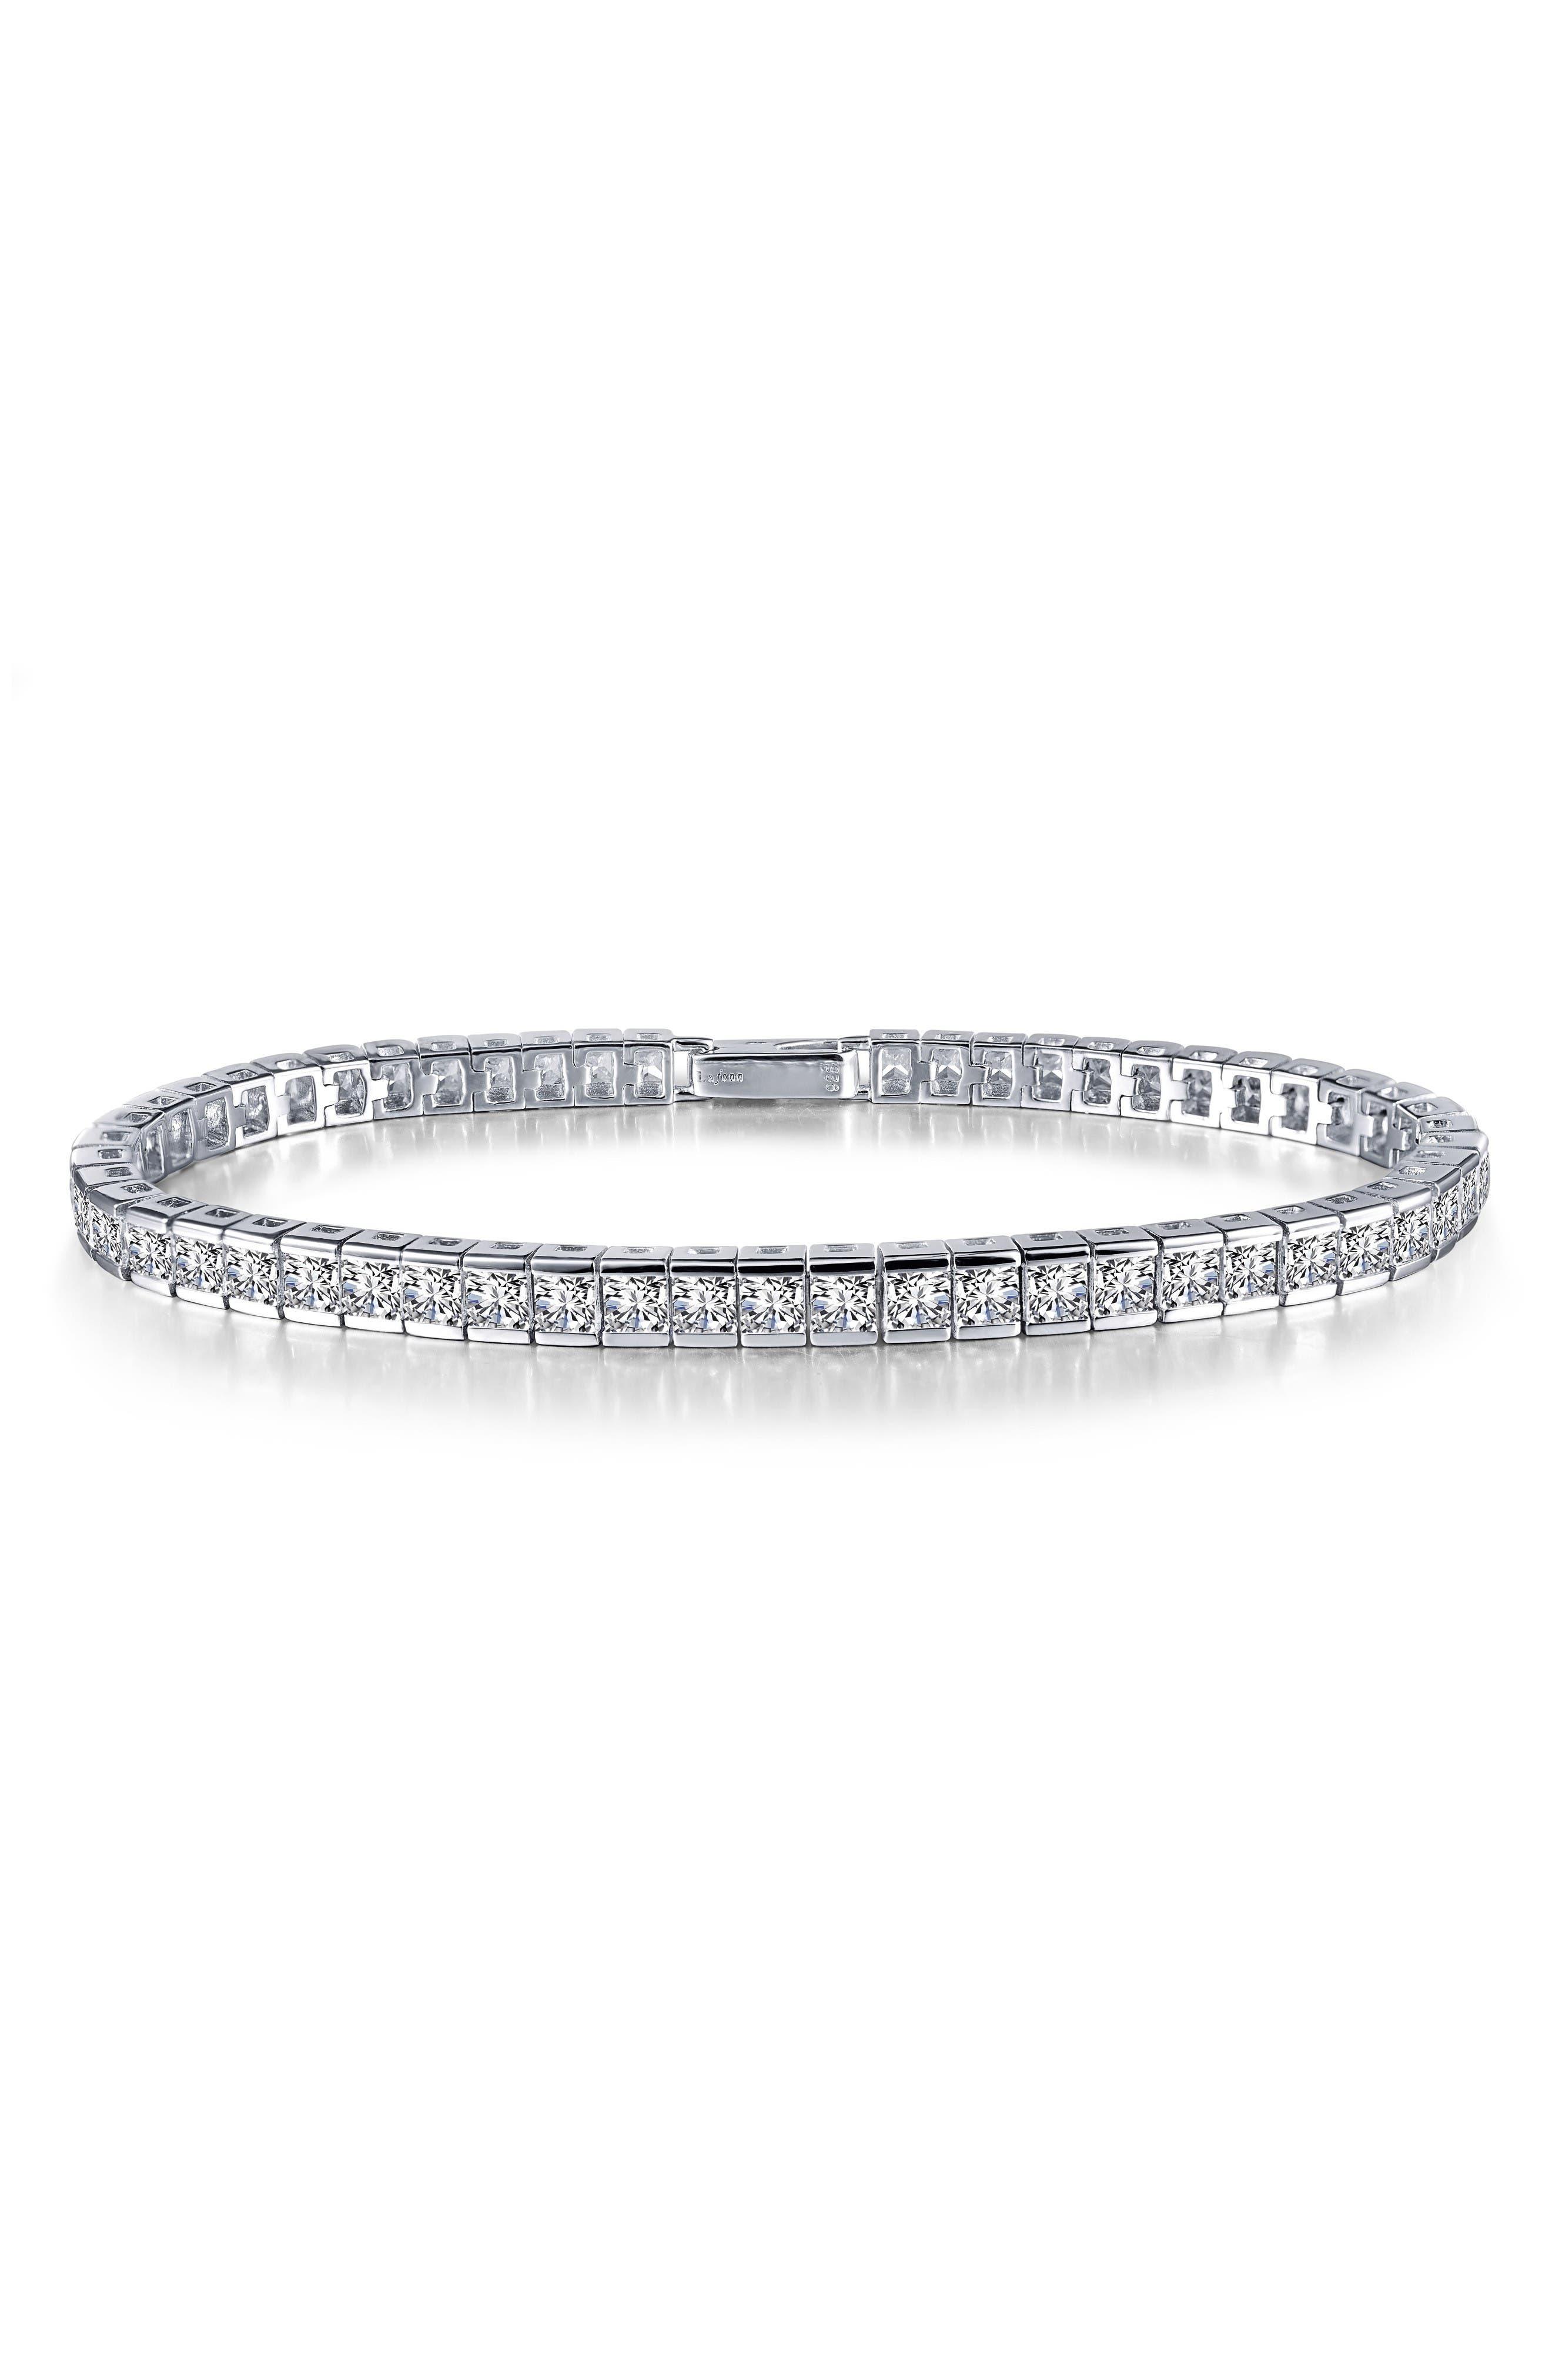 Main Image - Lafonn Princess Cut Tennis Bracelet